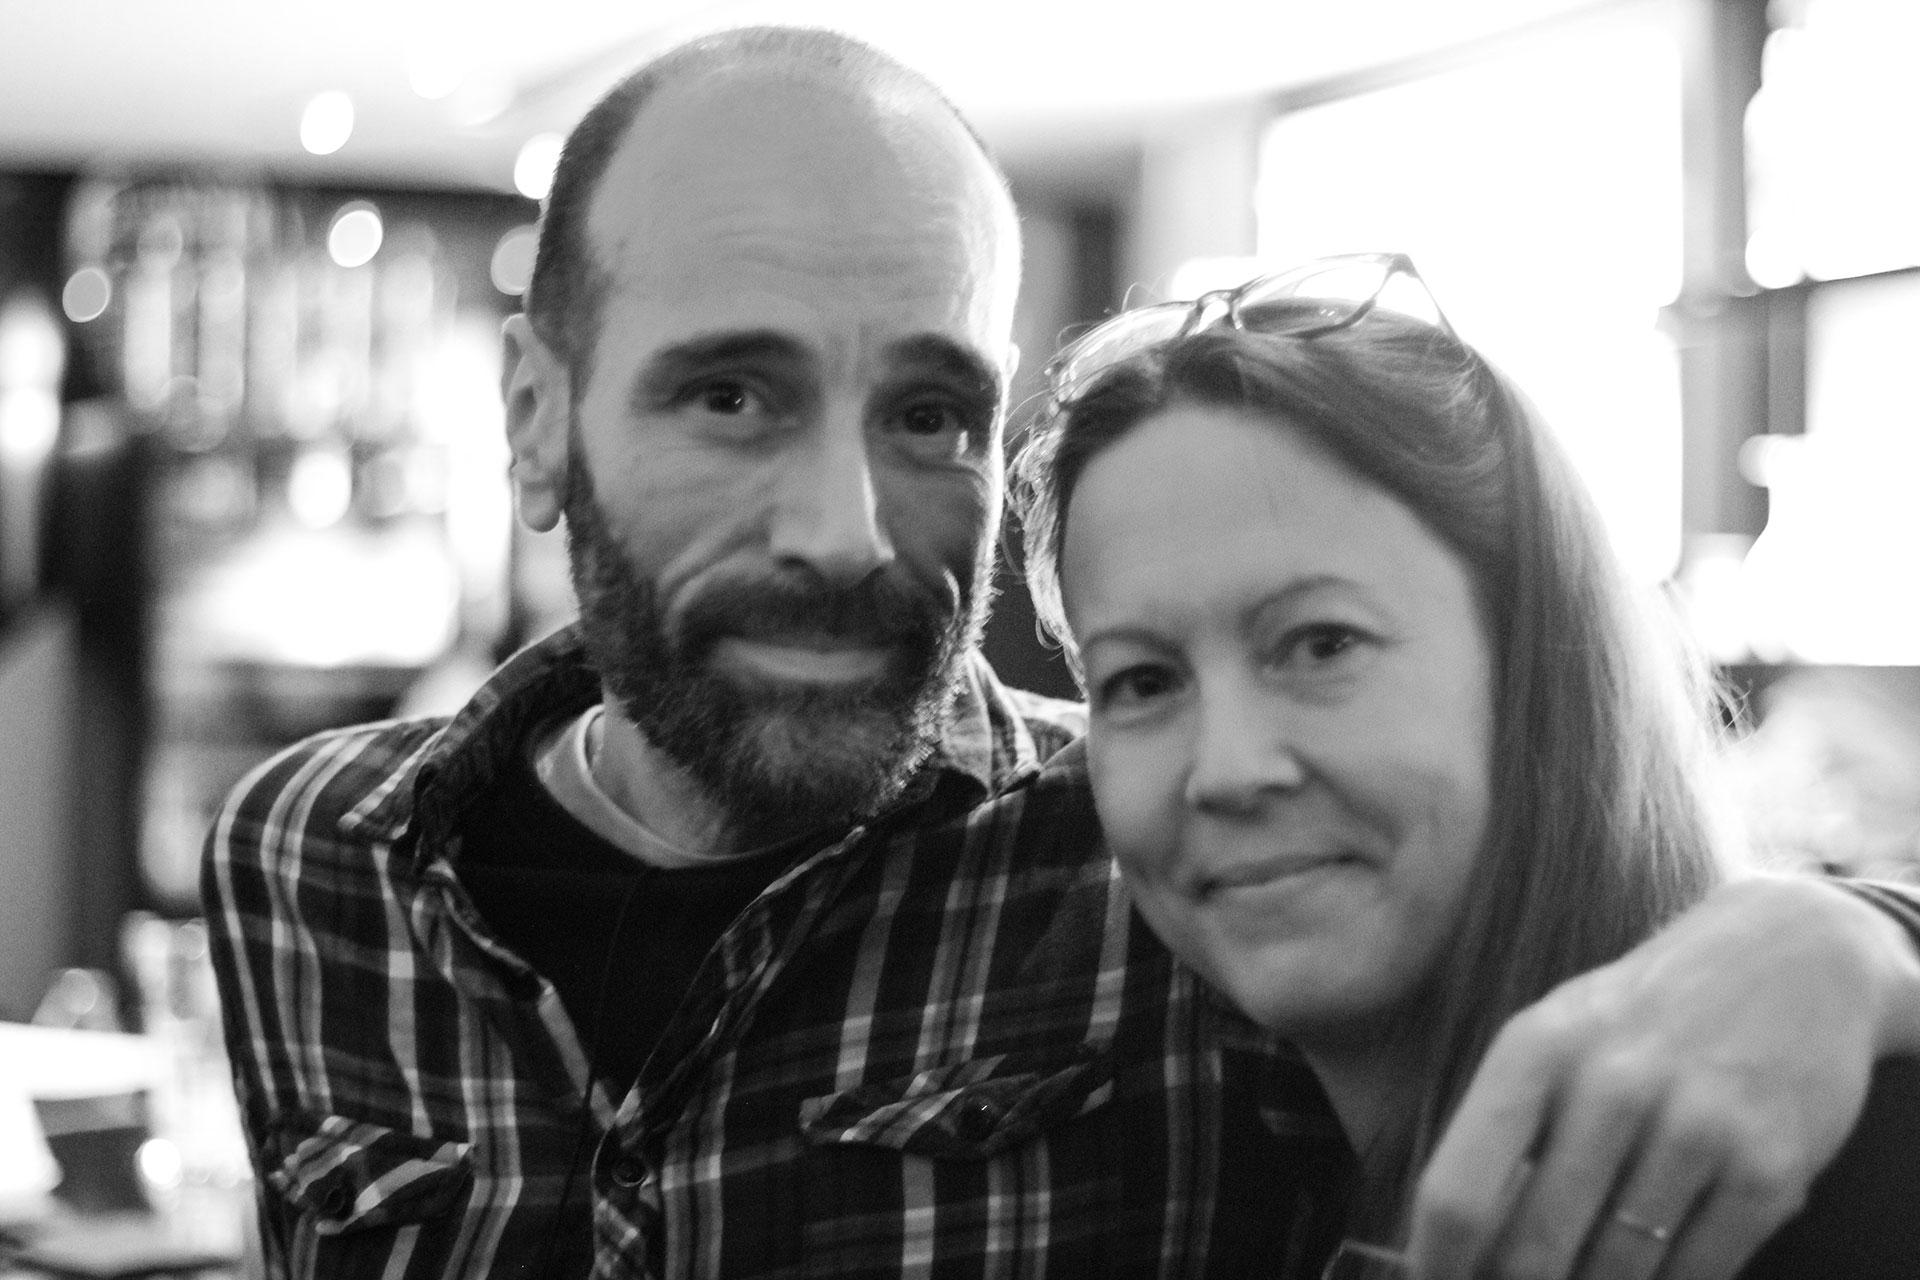 Jenny and Olivier